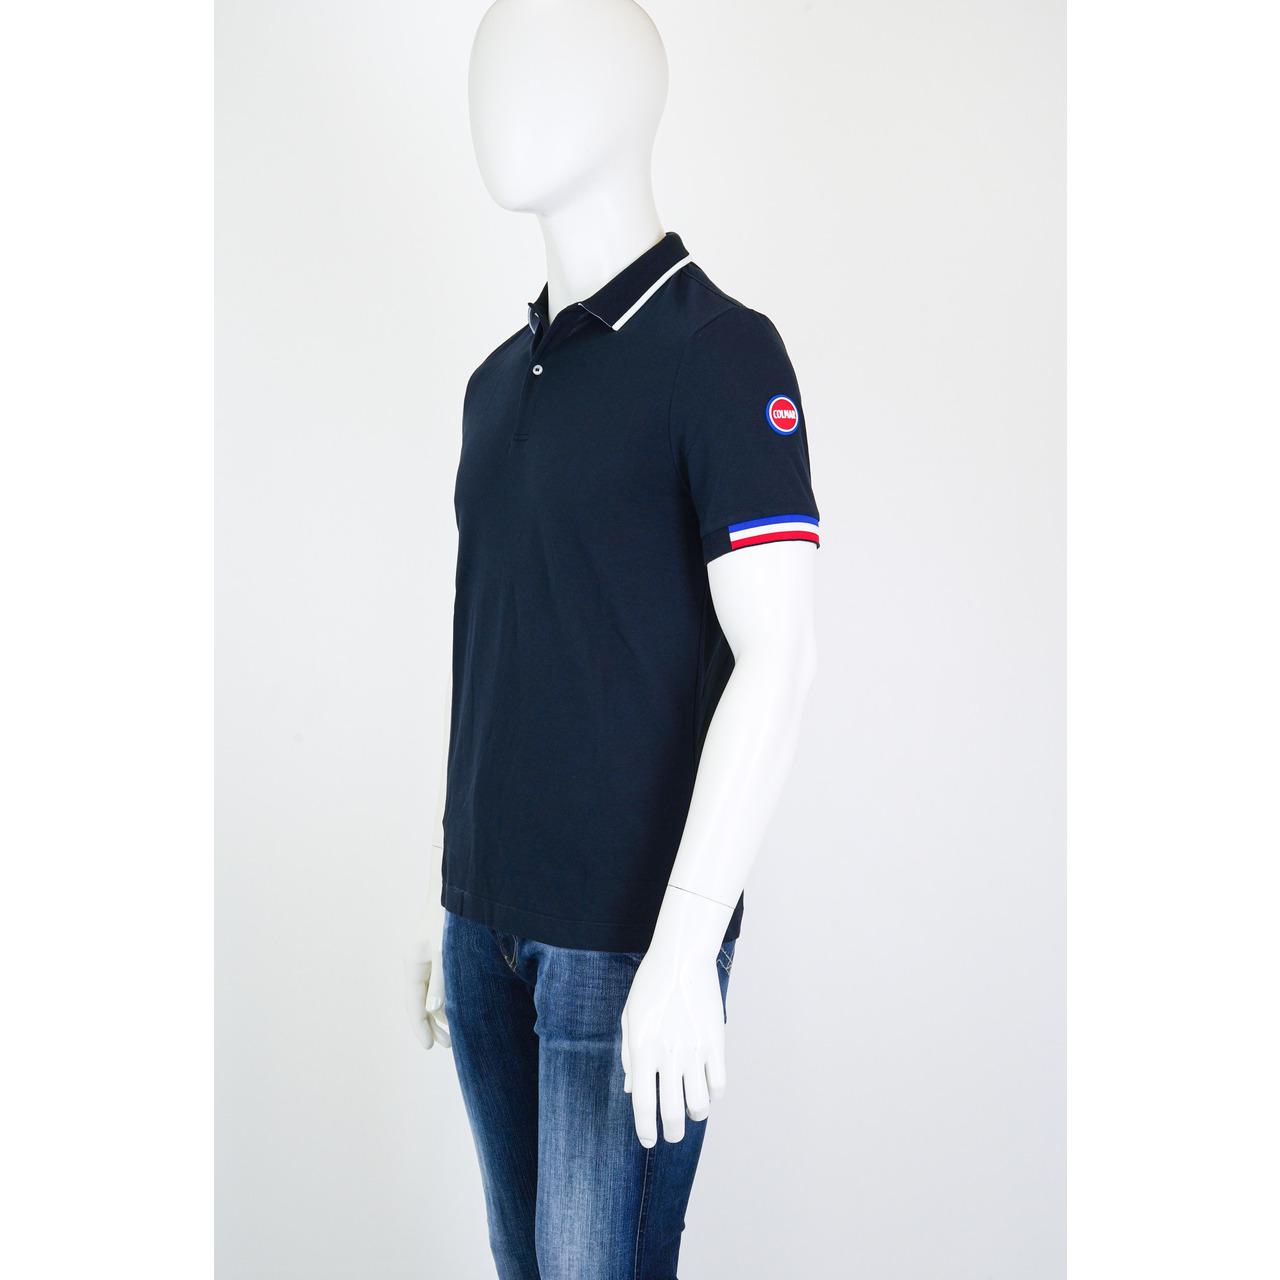 COLMAR - Polo - Shirt